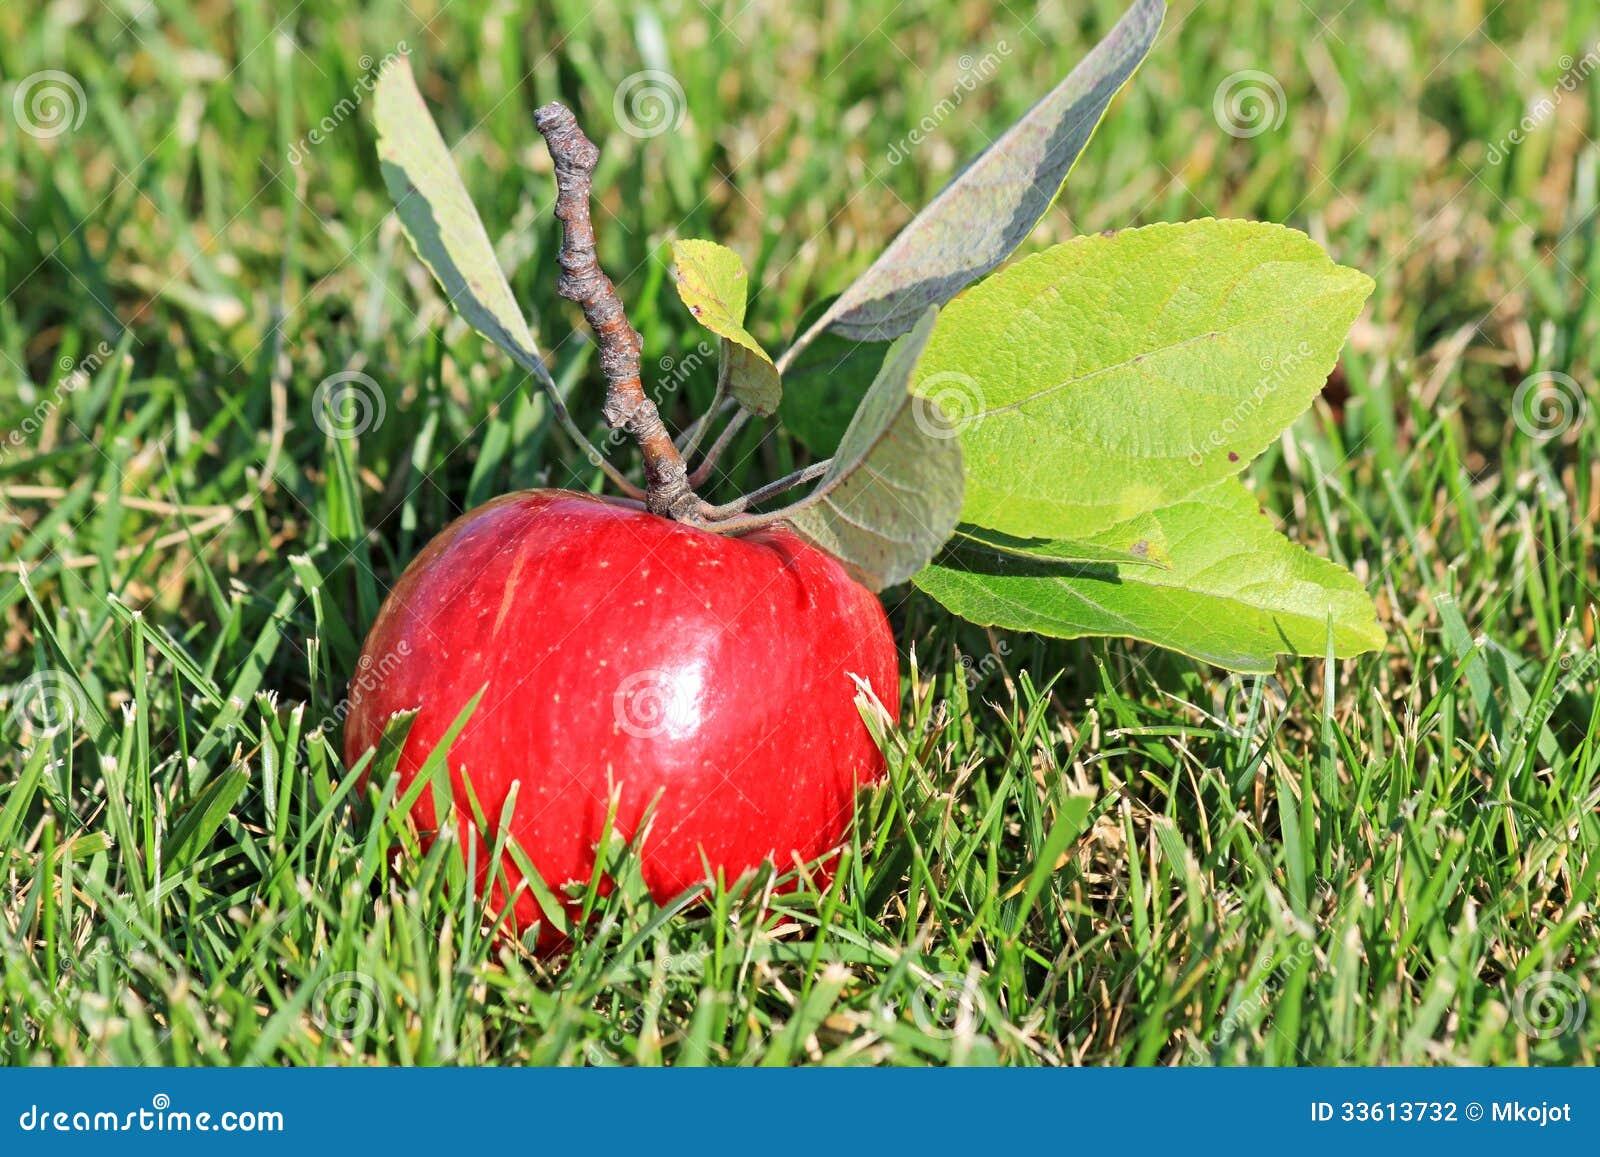 apple fruit background grass - photo #38